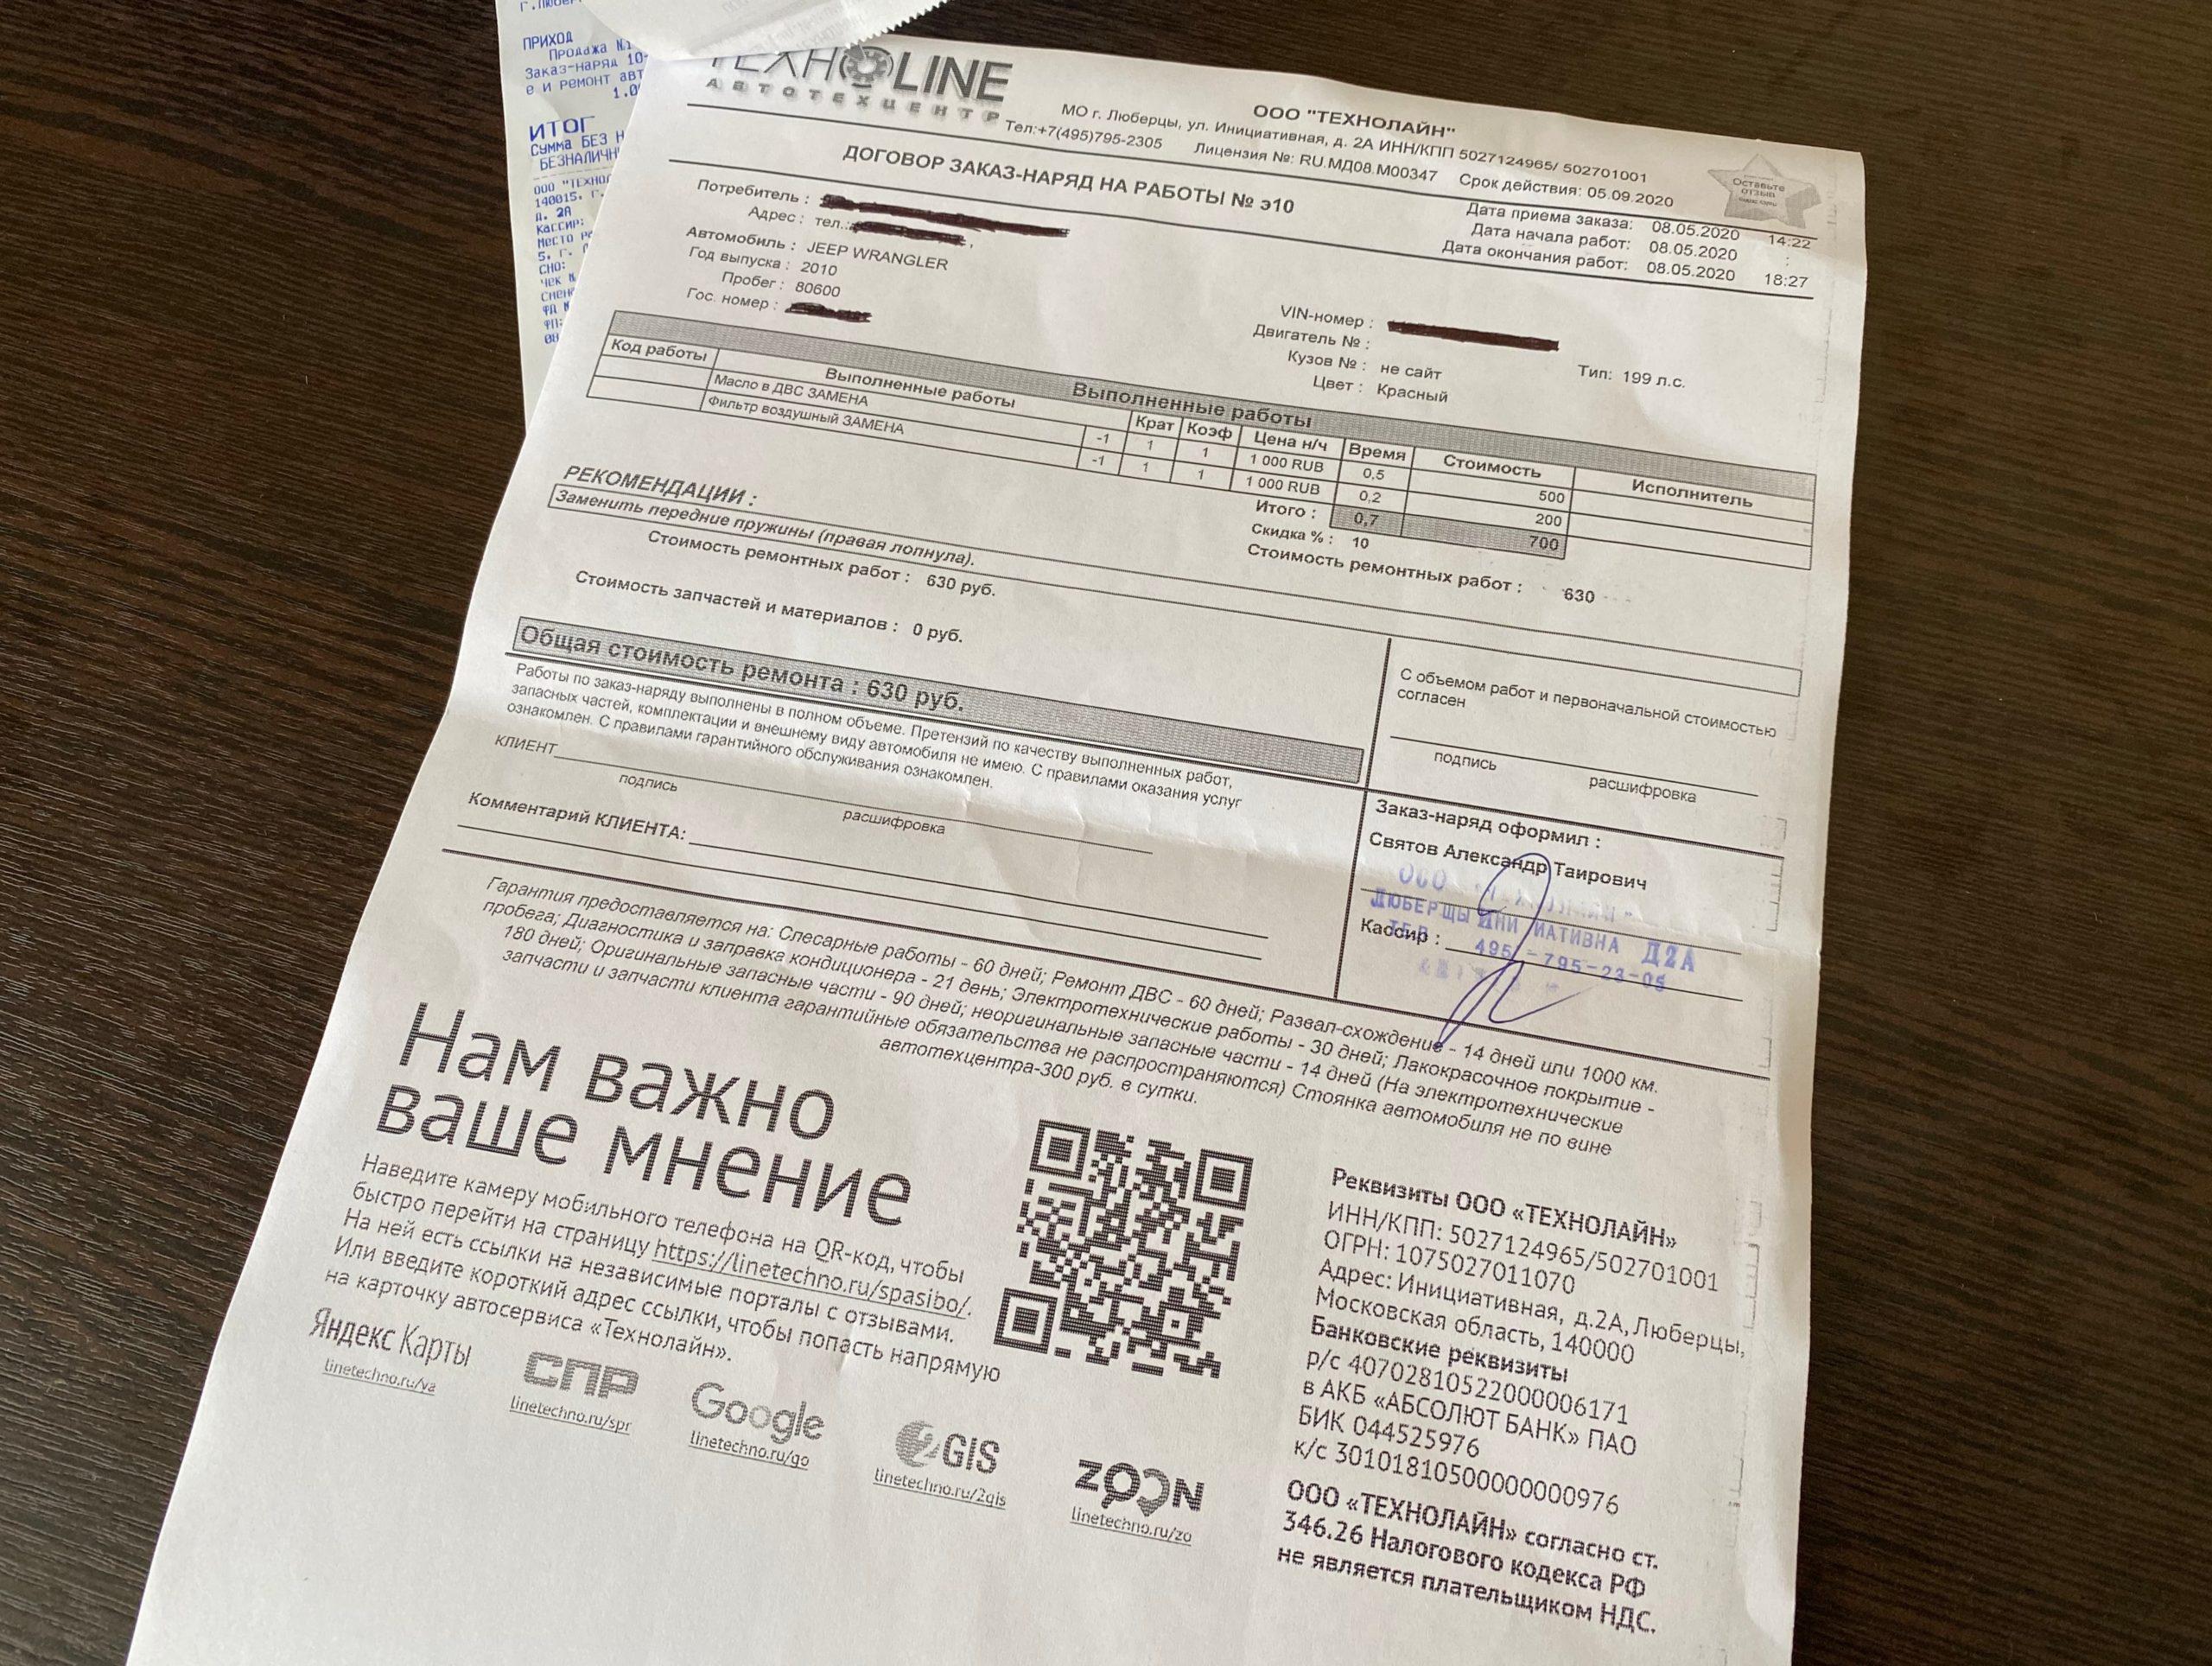 Заказ-наряд Технолайн Люберцы